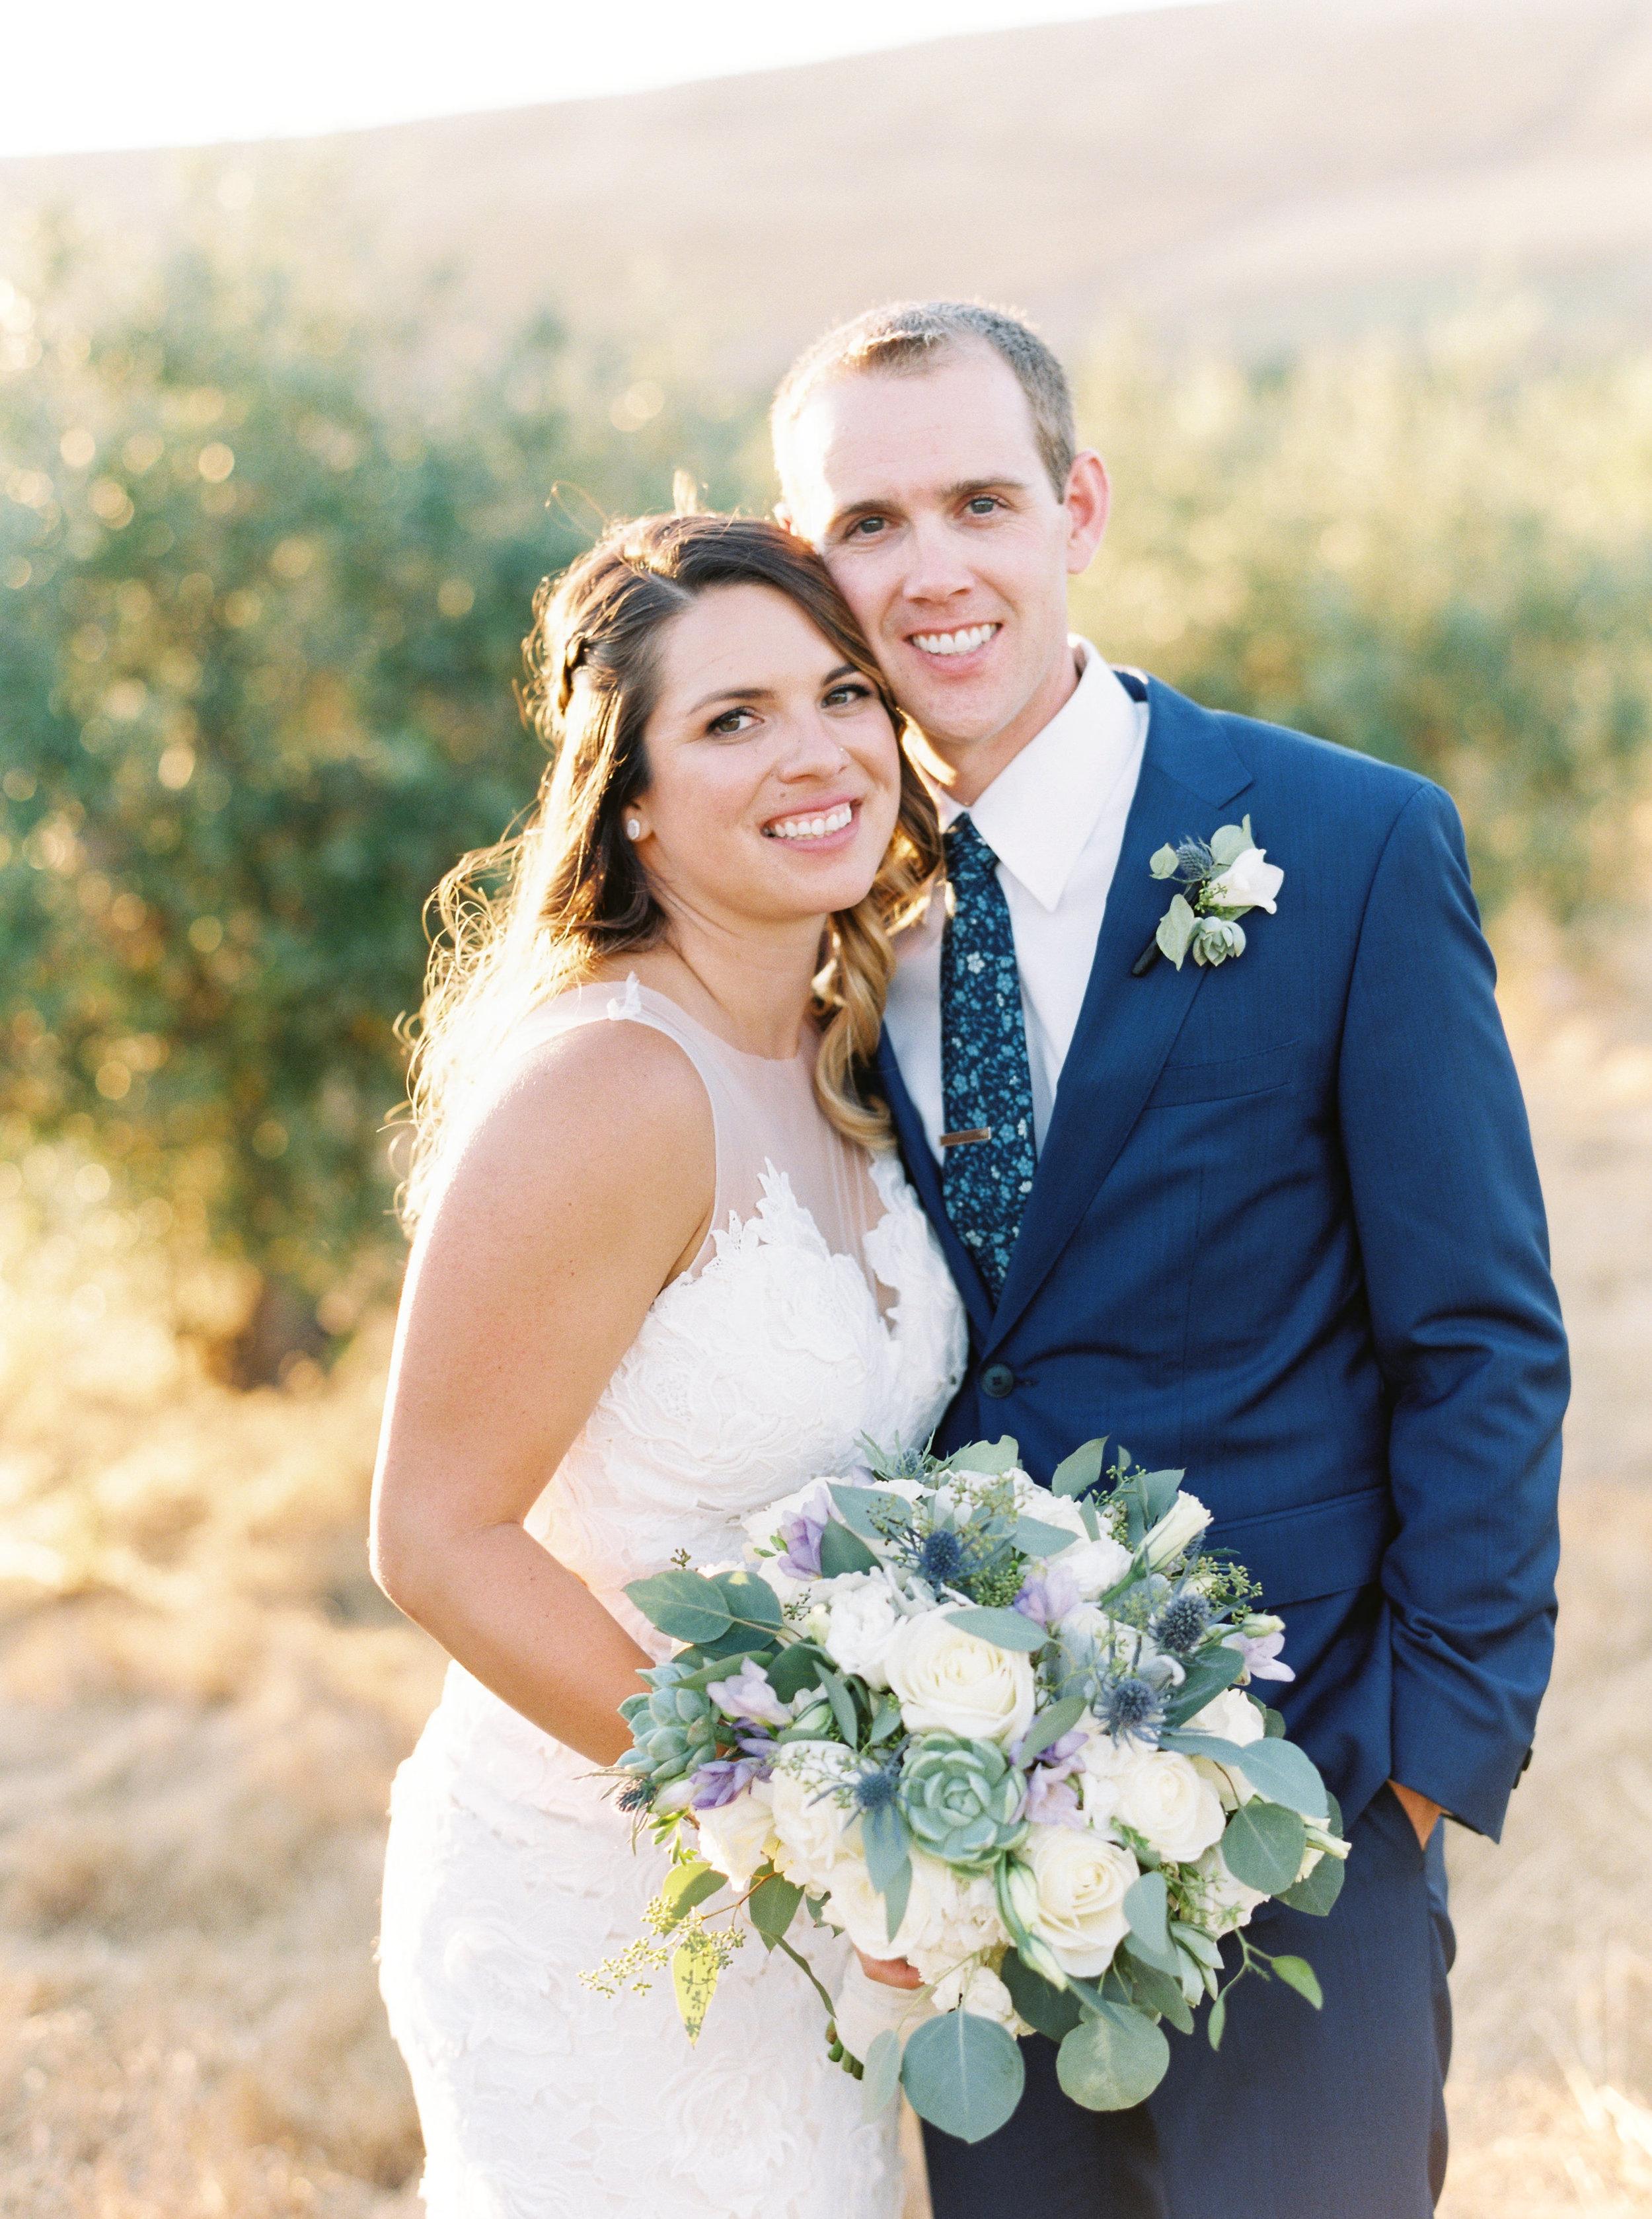 the-purple-orchid-resort-wedding-in-livermore-california-173.jpg